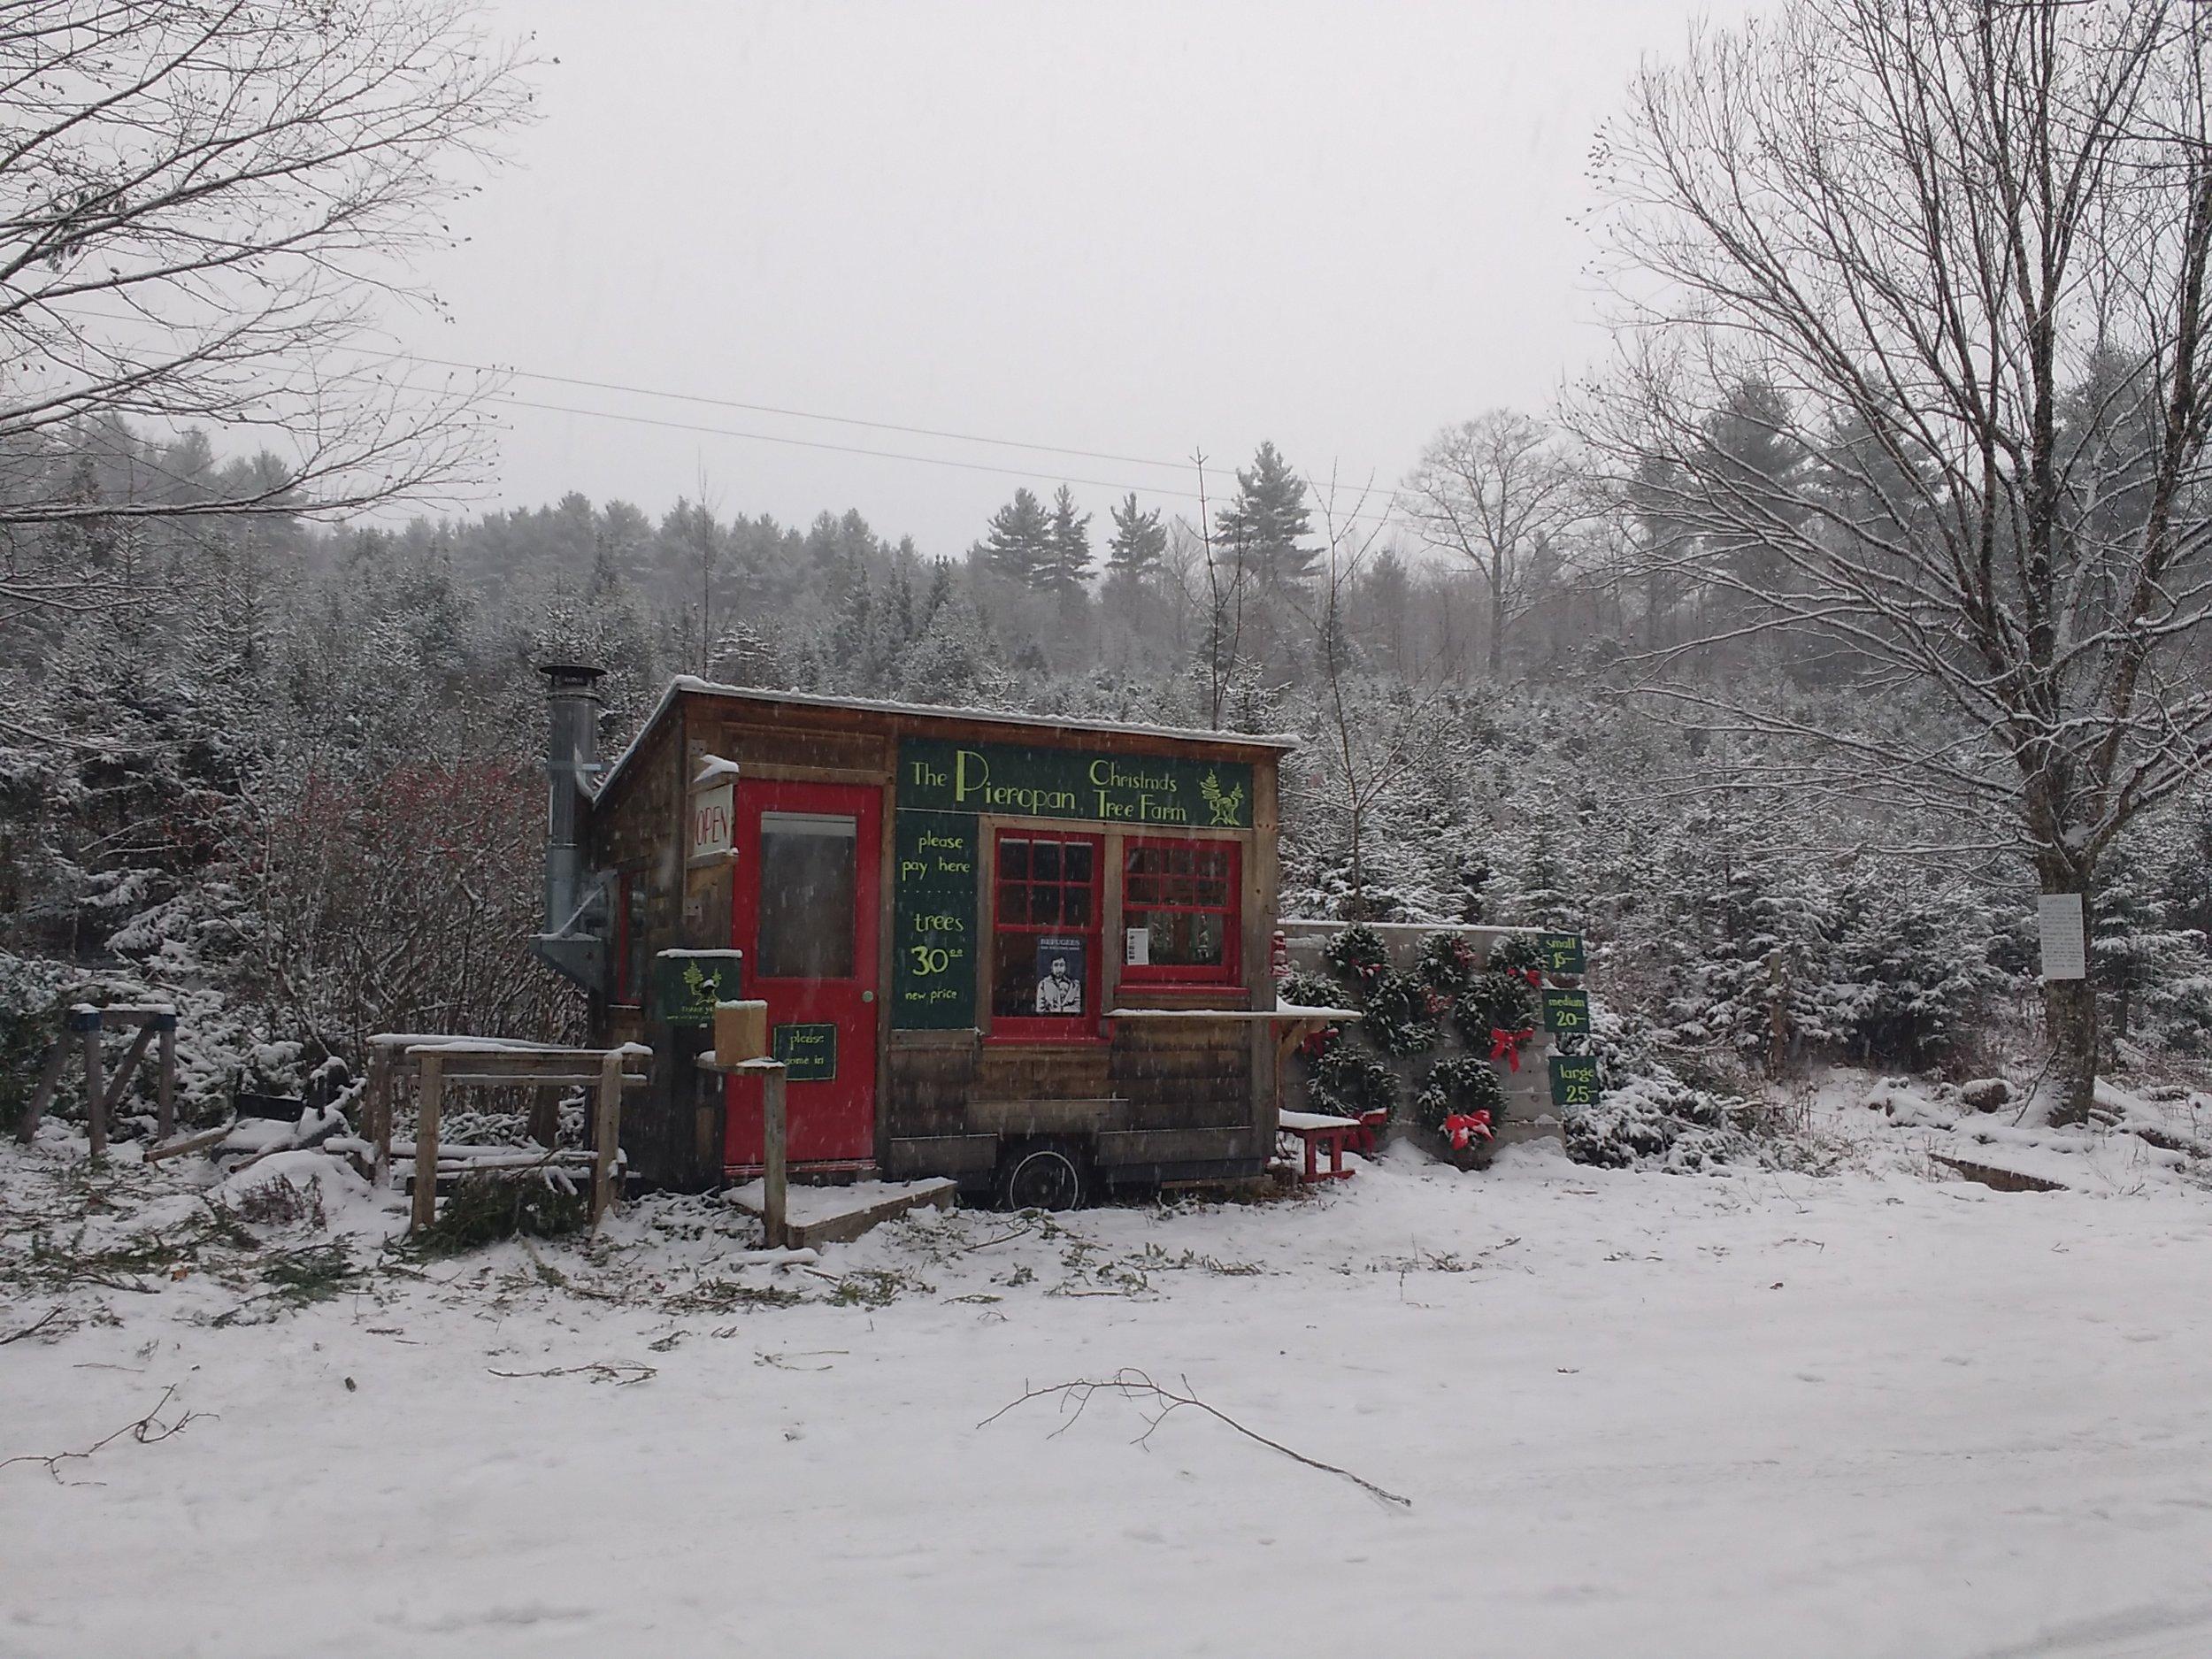 The Pieropan Christmas Tree Farm